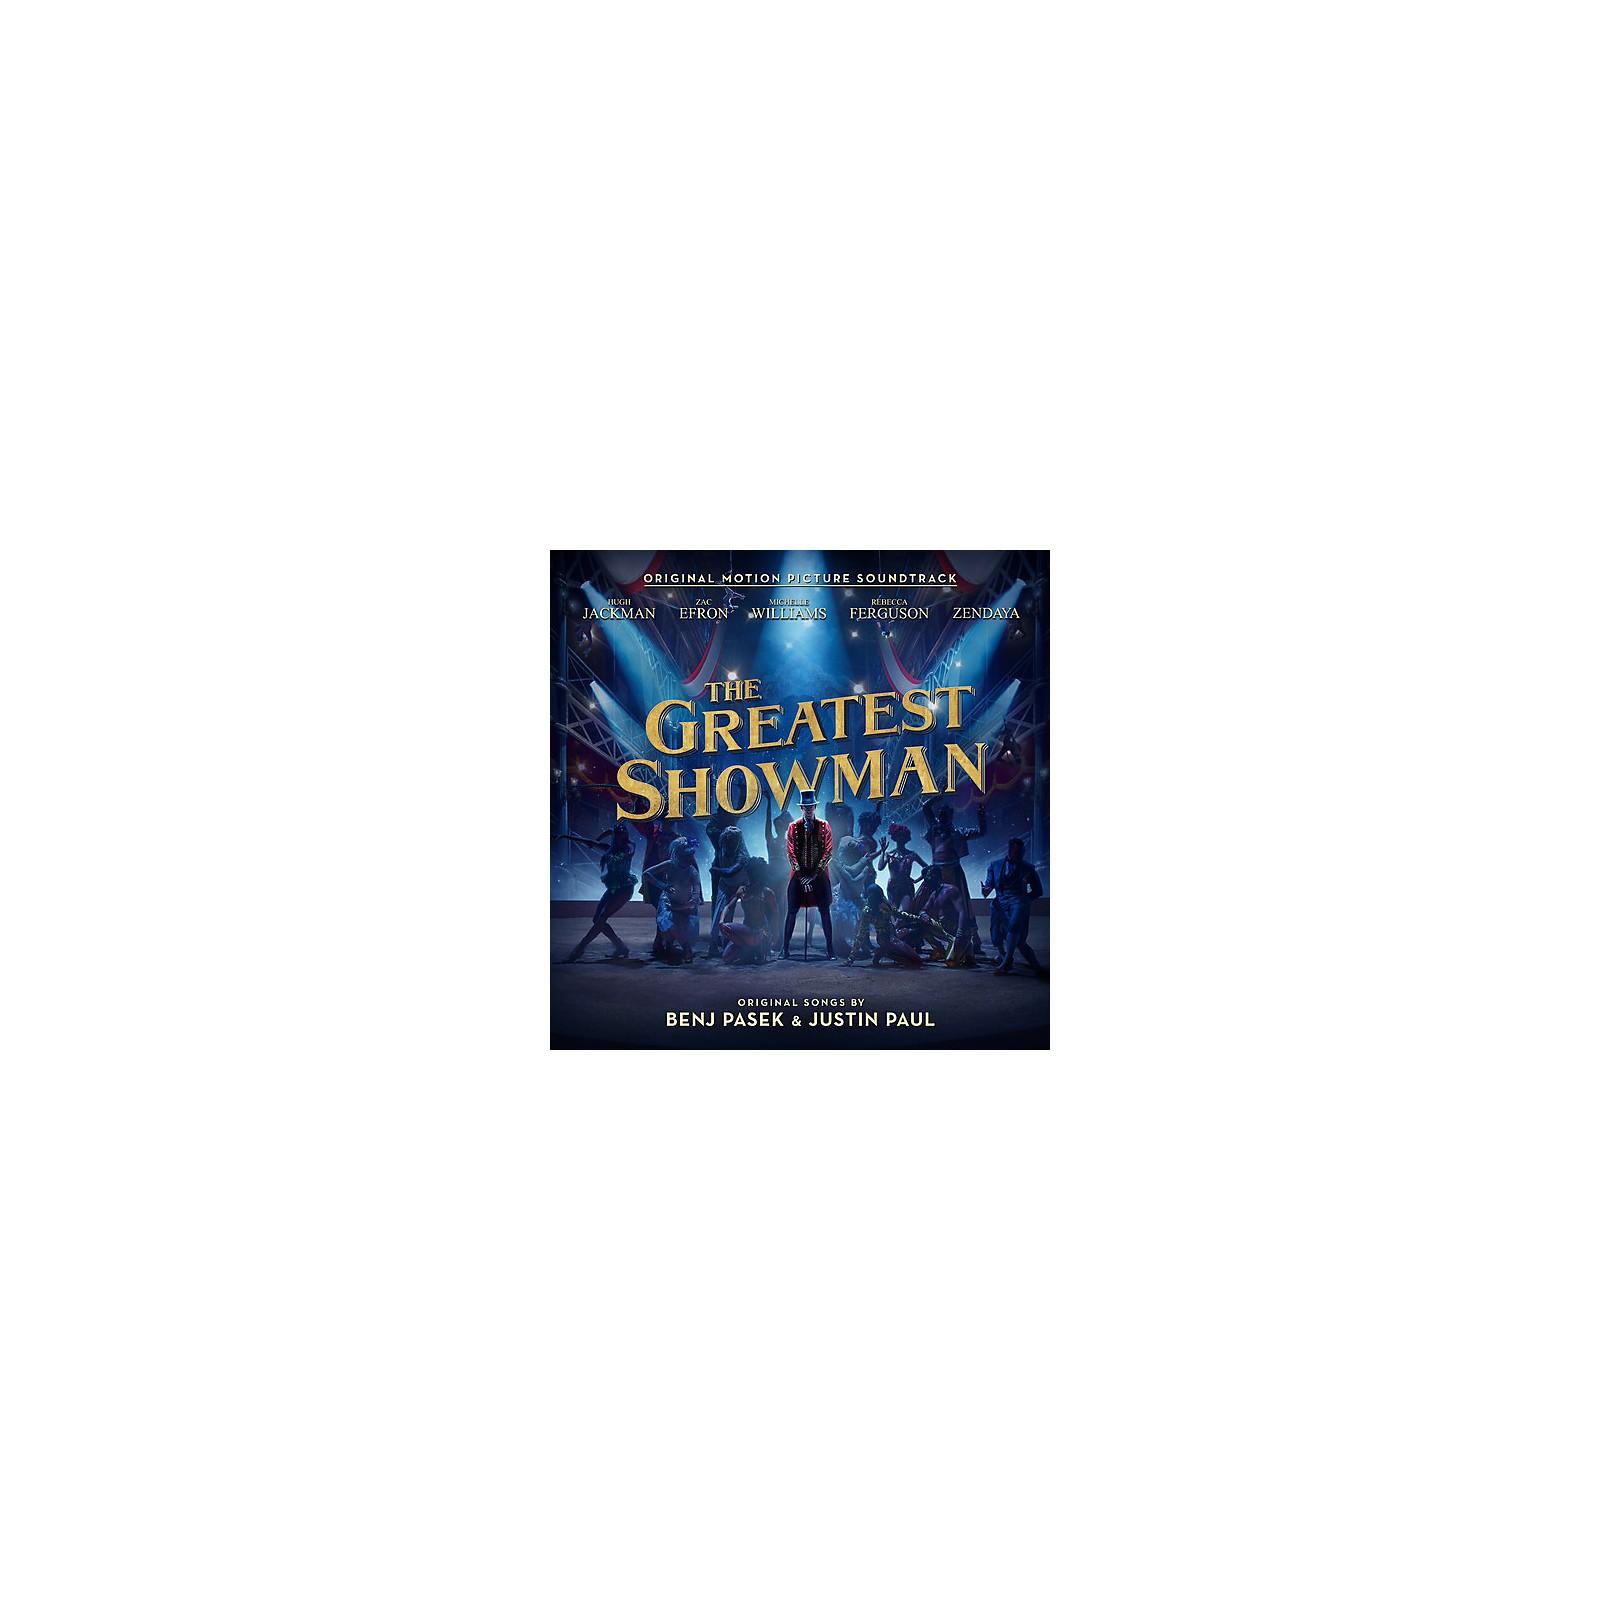 WEA Various Artists - The Greatest Showman (Original Motion Picture Soundtrack)